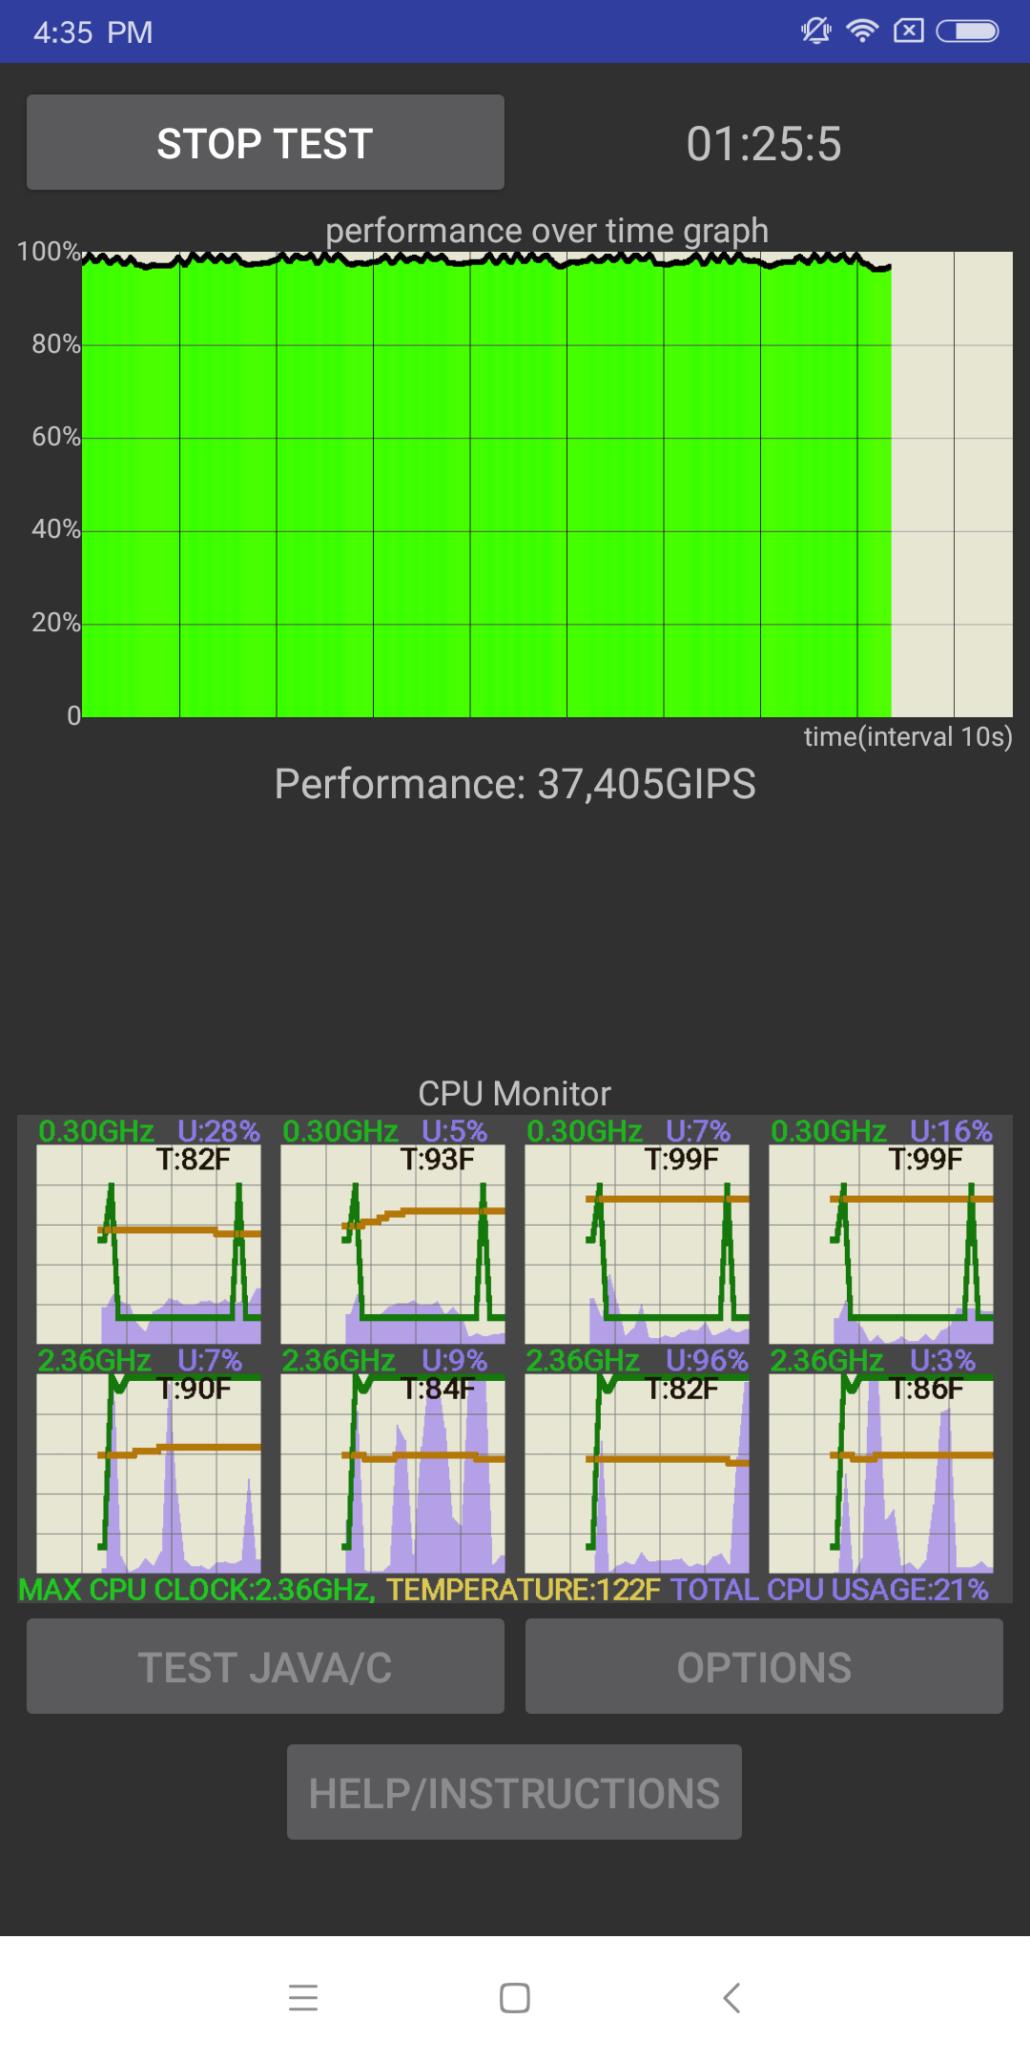 screenshot_2018-01-29-16-35-31-813_skynet-cputhrottlingtest-2